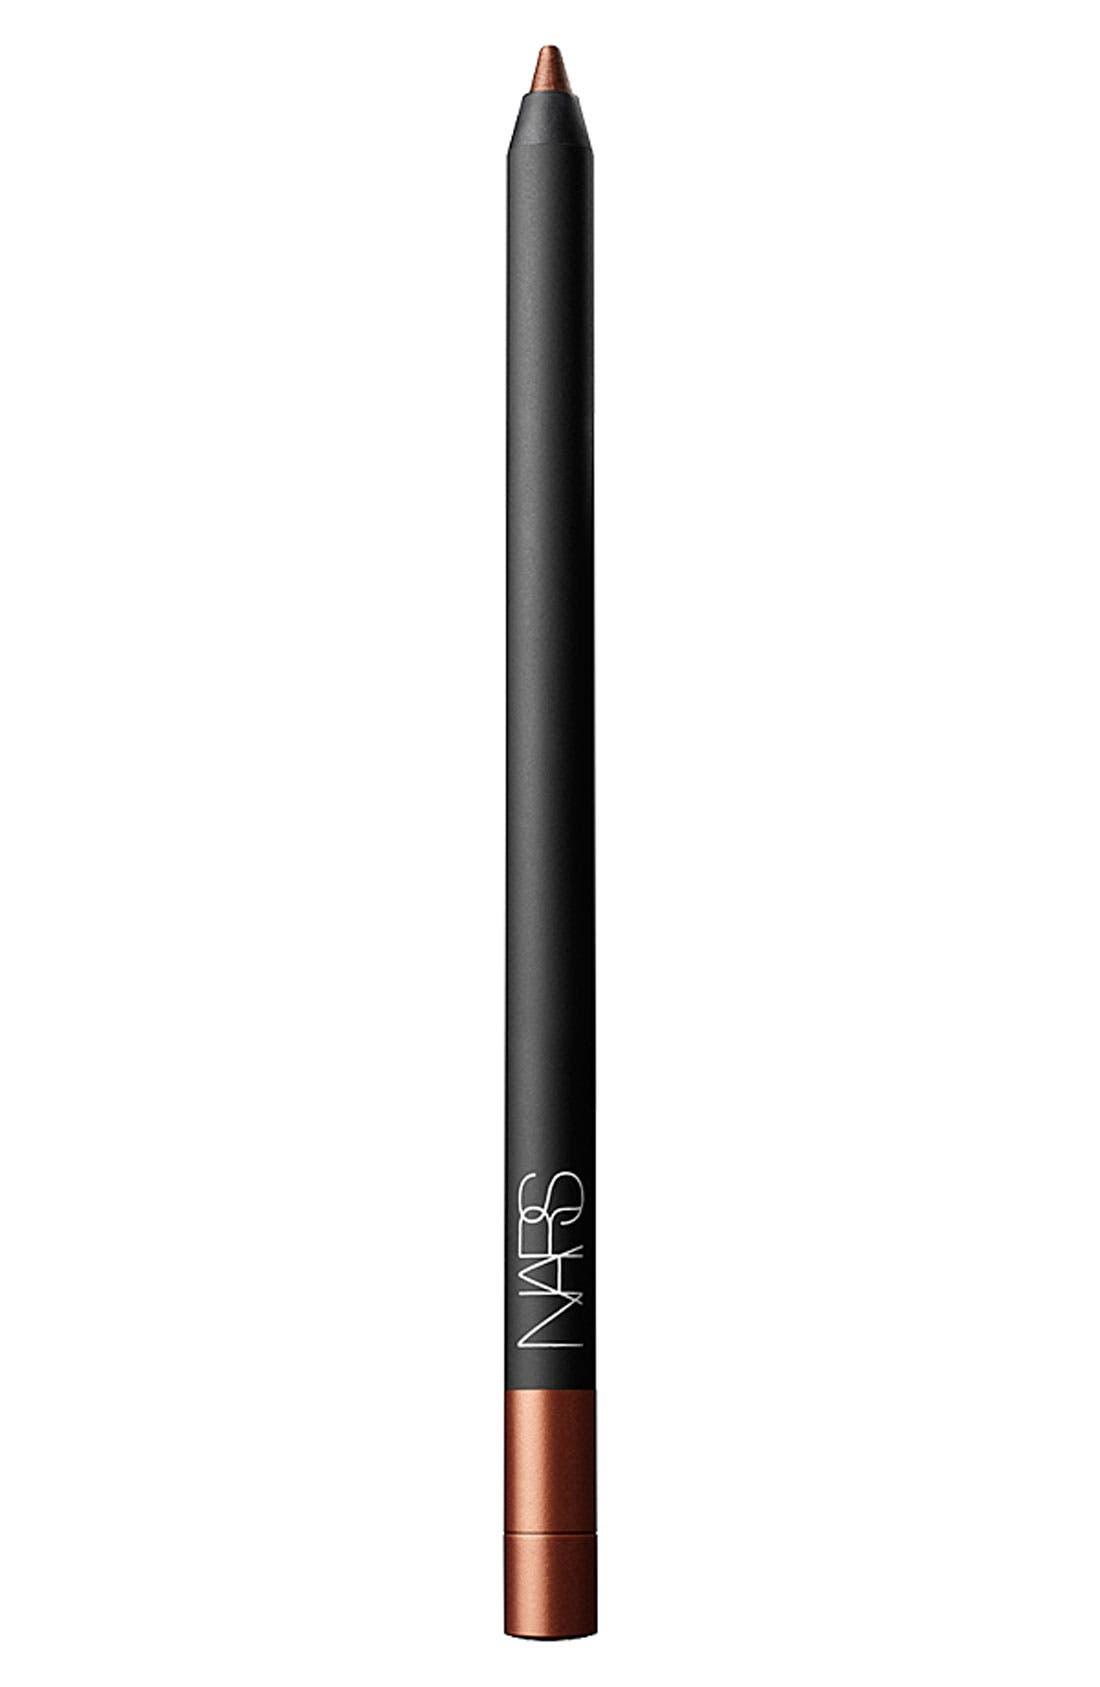 Nars Larger Than Life Long Wear Eyeliner - Via Appia